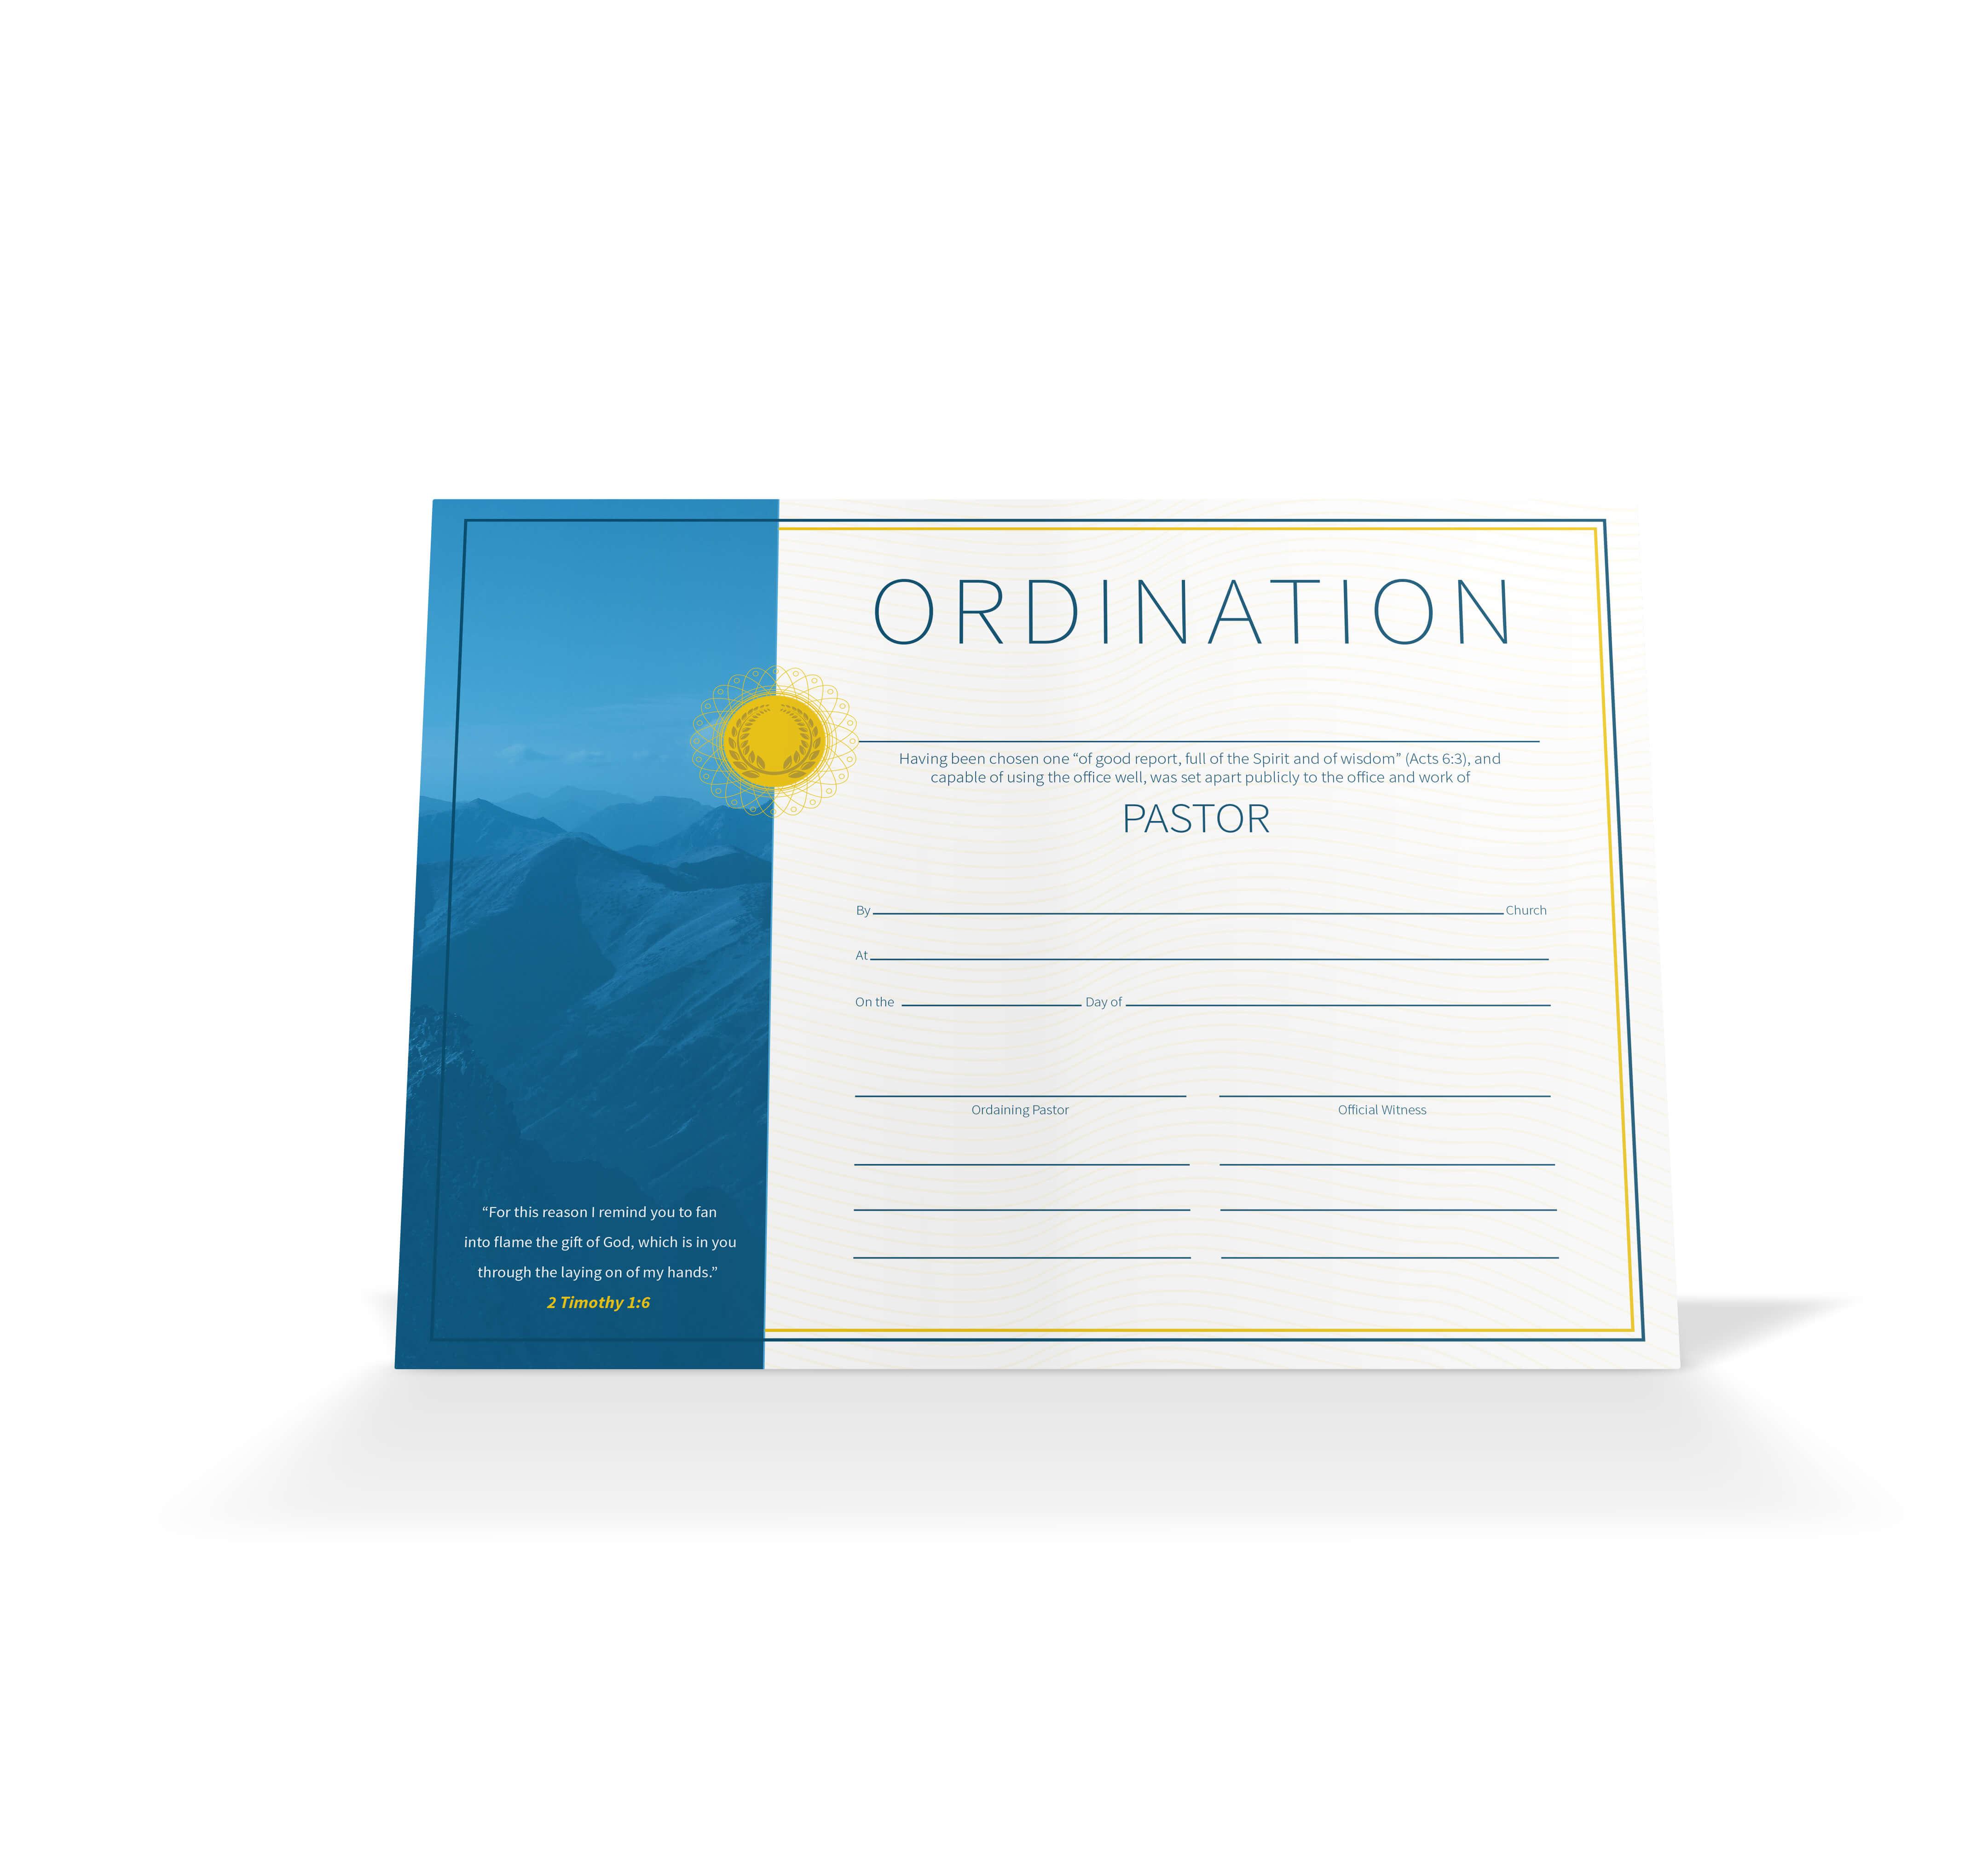 Pastor Ordination Certificate – Vineyard Digital Membership Within Certificate Of Ordination Template